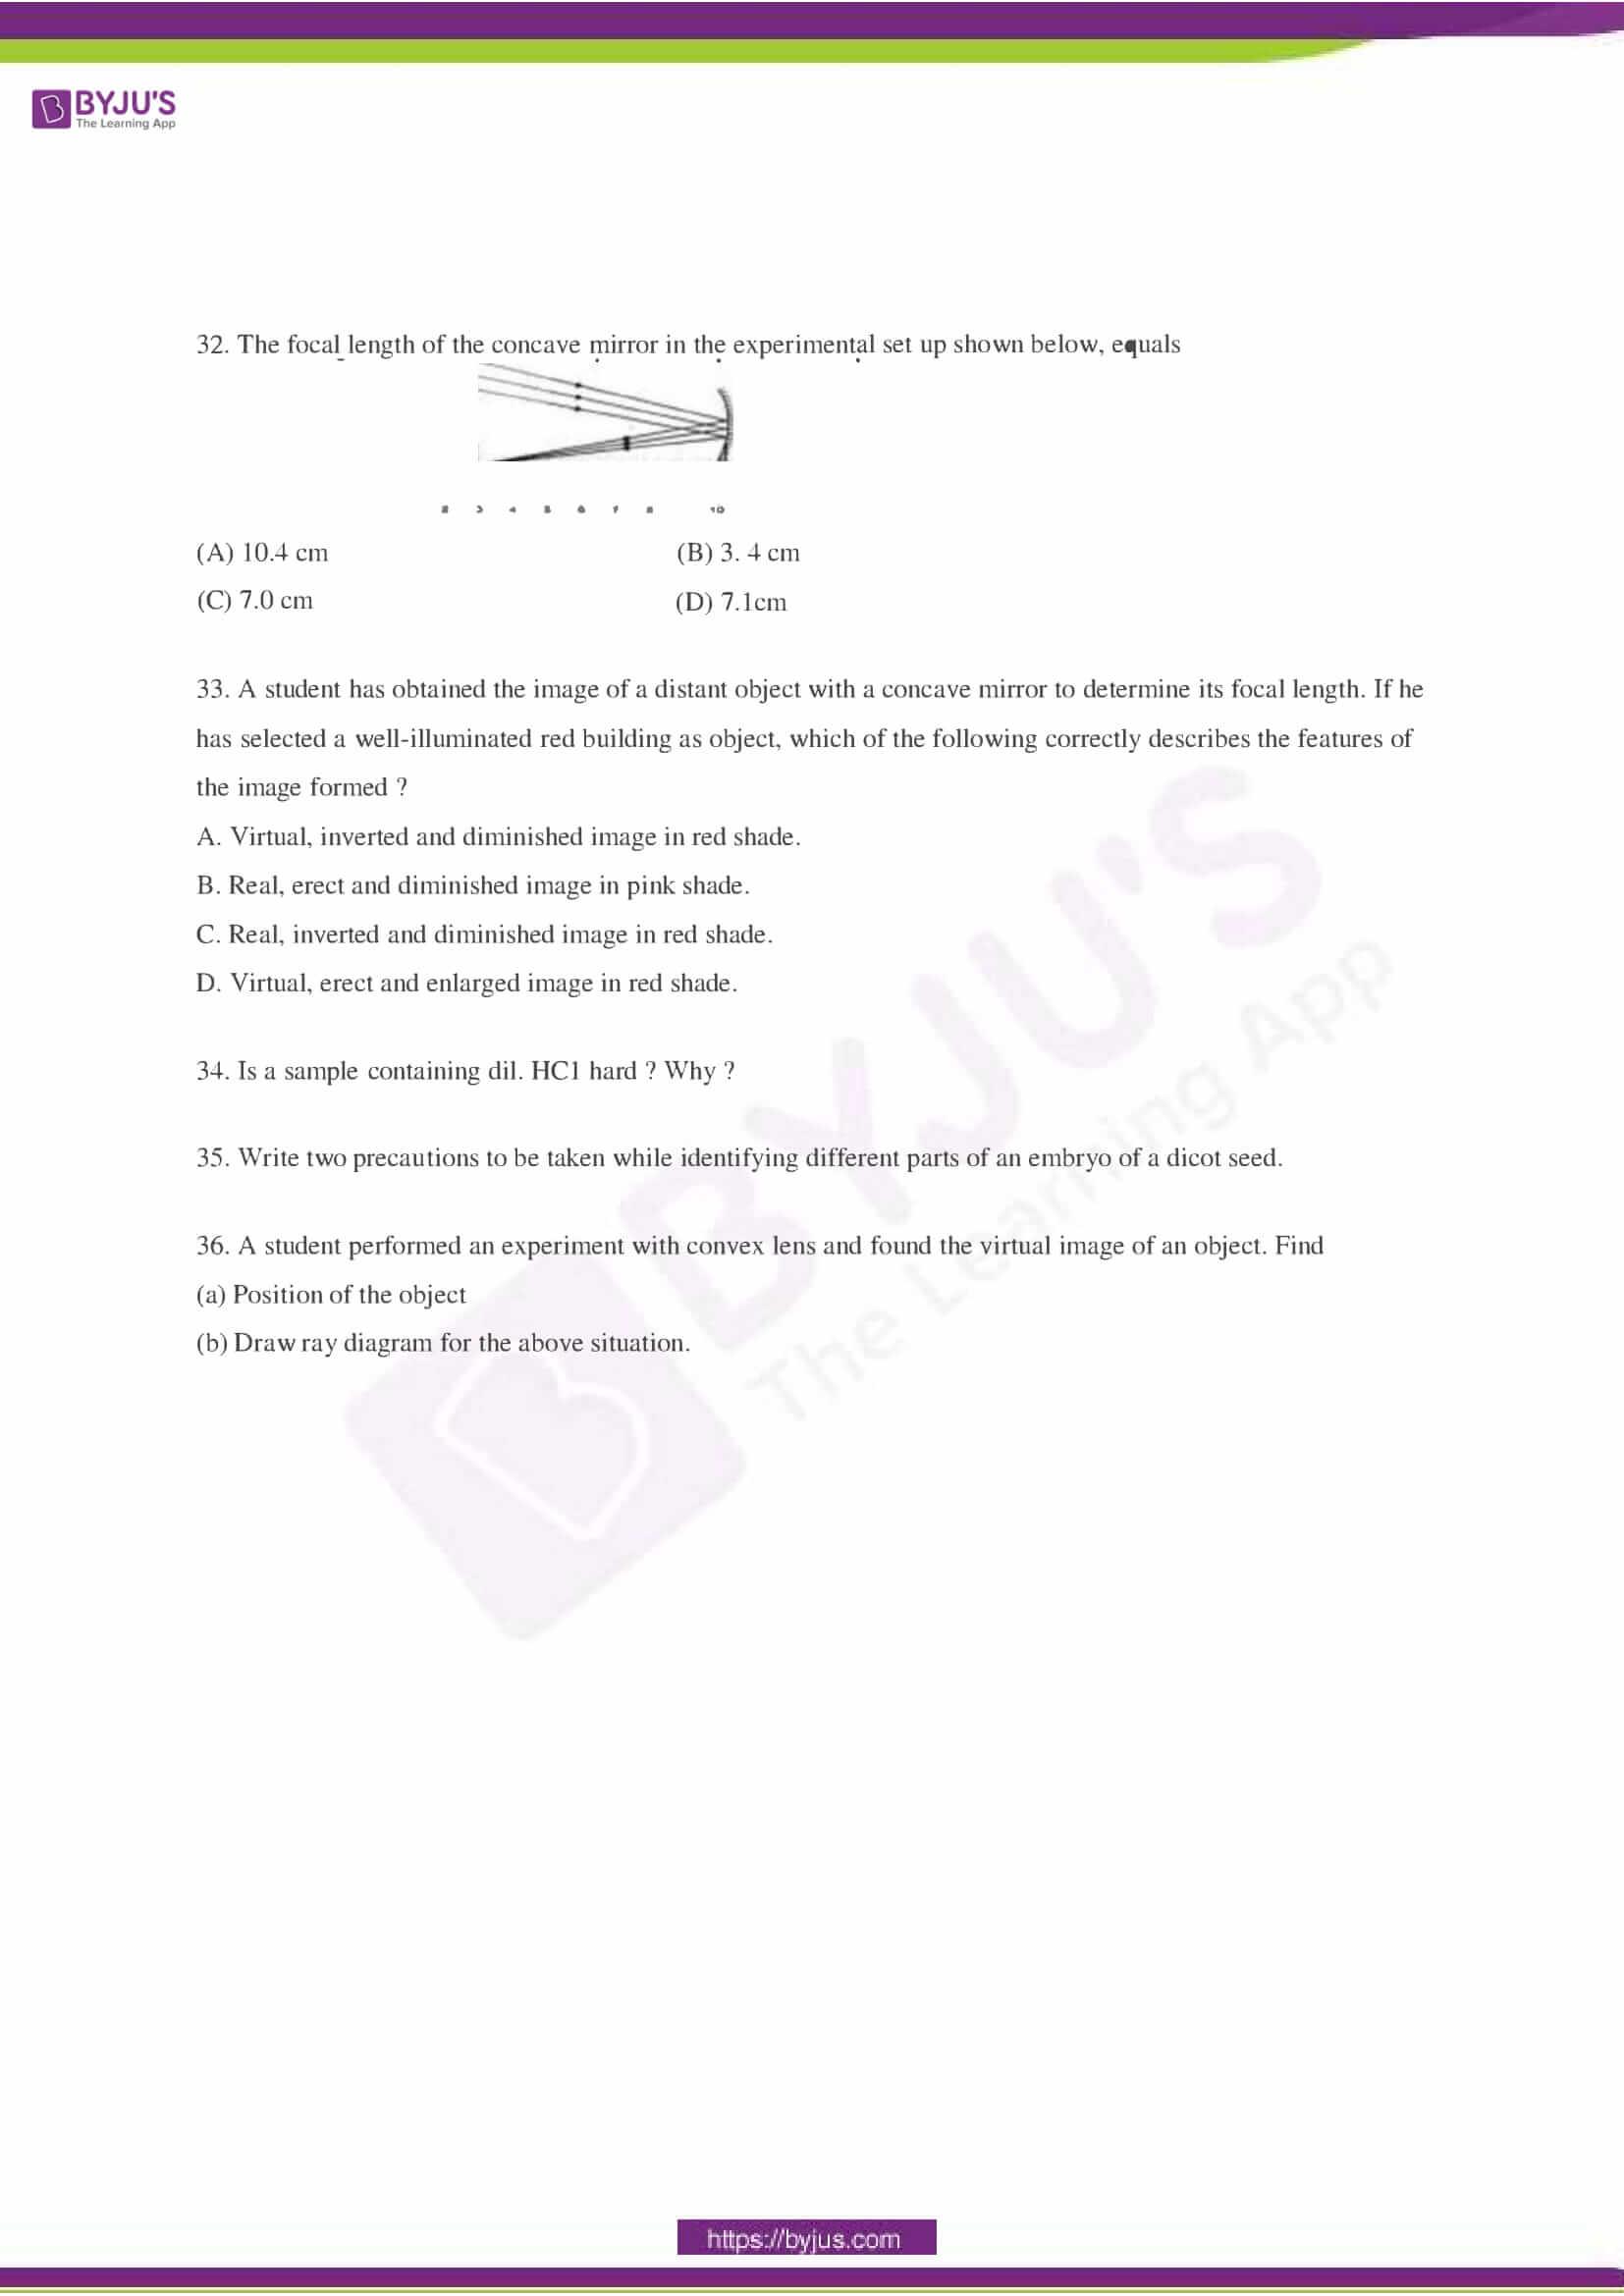 CBSE Class 10 Science Sample Paper Set 2-6